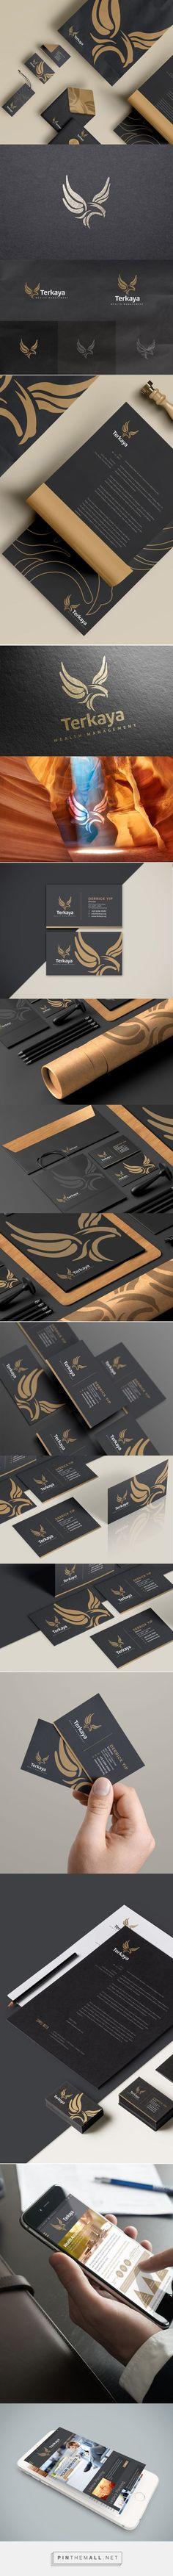 Terkaya wealth management branding by lemongraphic